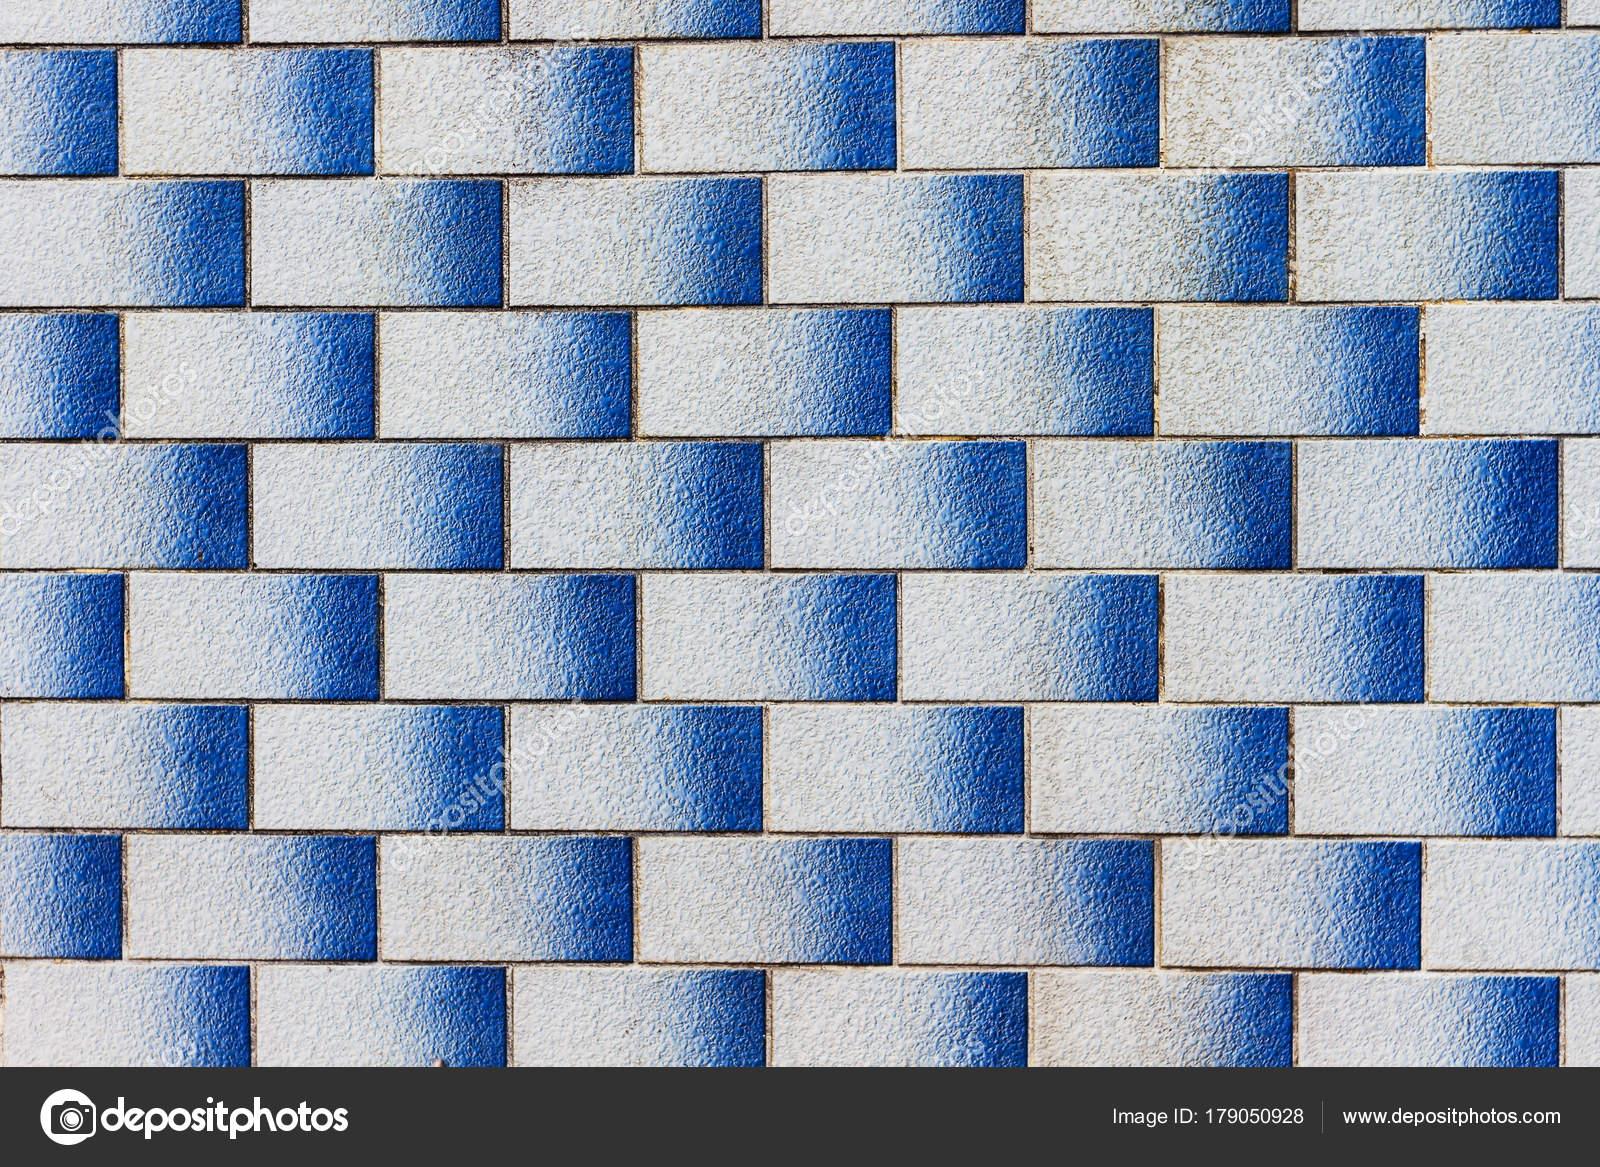 blaue fliese wand textur sch ne muster stockfoto patrapee5413 179050928. Black Bedroom Furniture Sets. Home Design Ideas